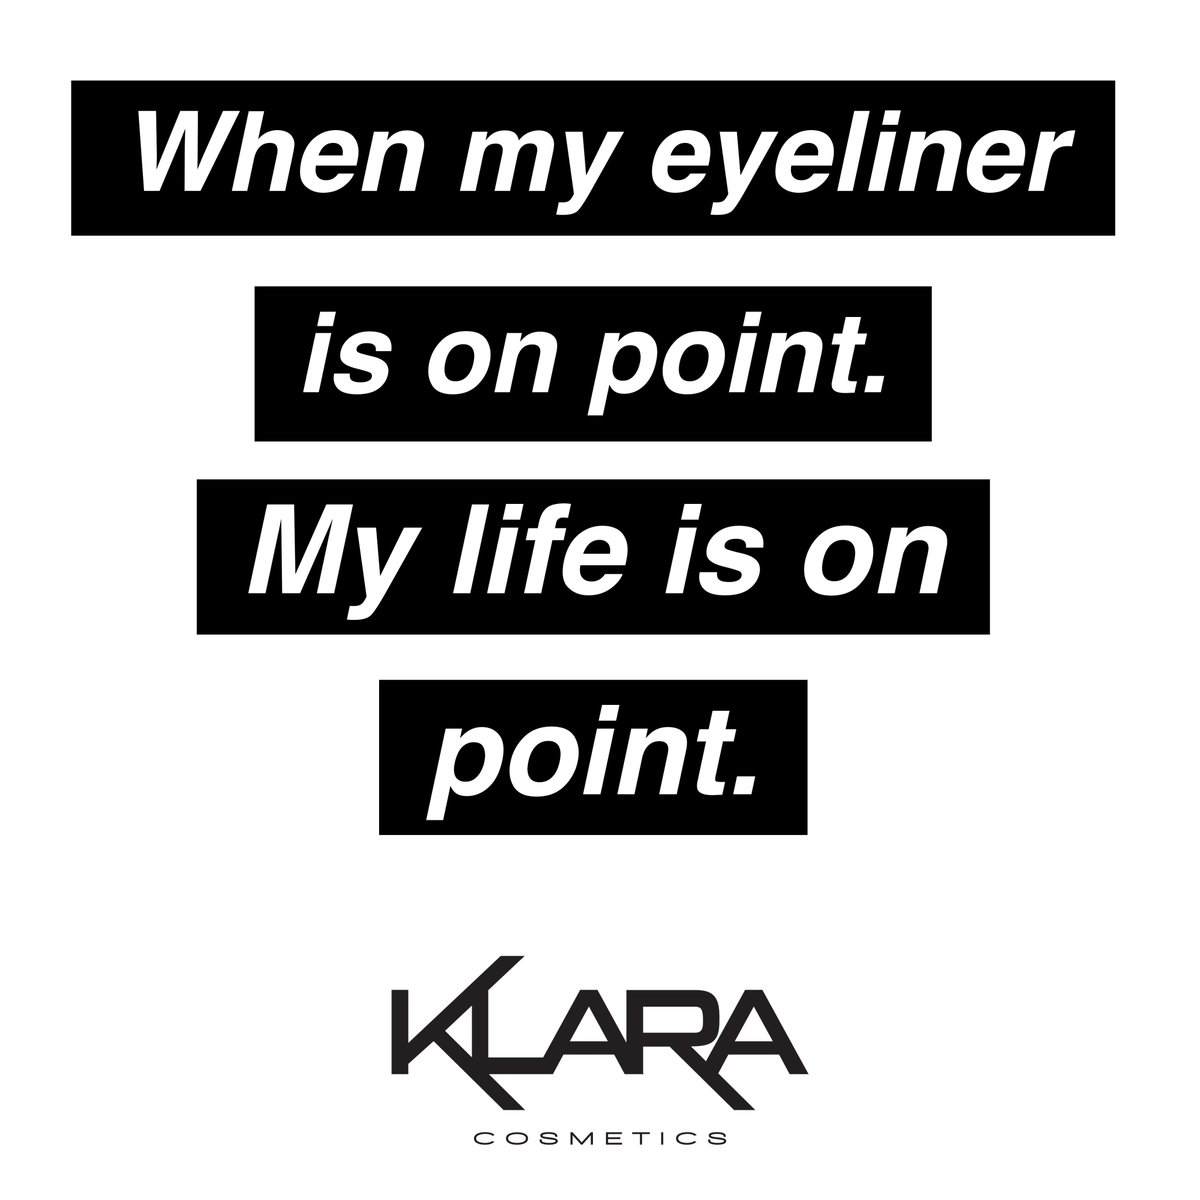 Klara Cosmetics Klaracosmetics Twitter Profile Twipu Liquid Eyeliner 1 Black The Relief Of Drawing On Perfect Get